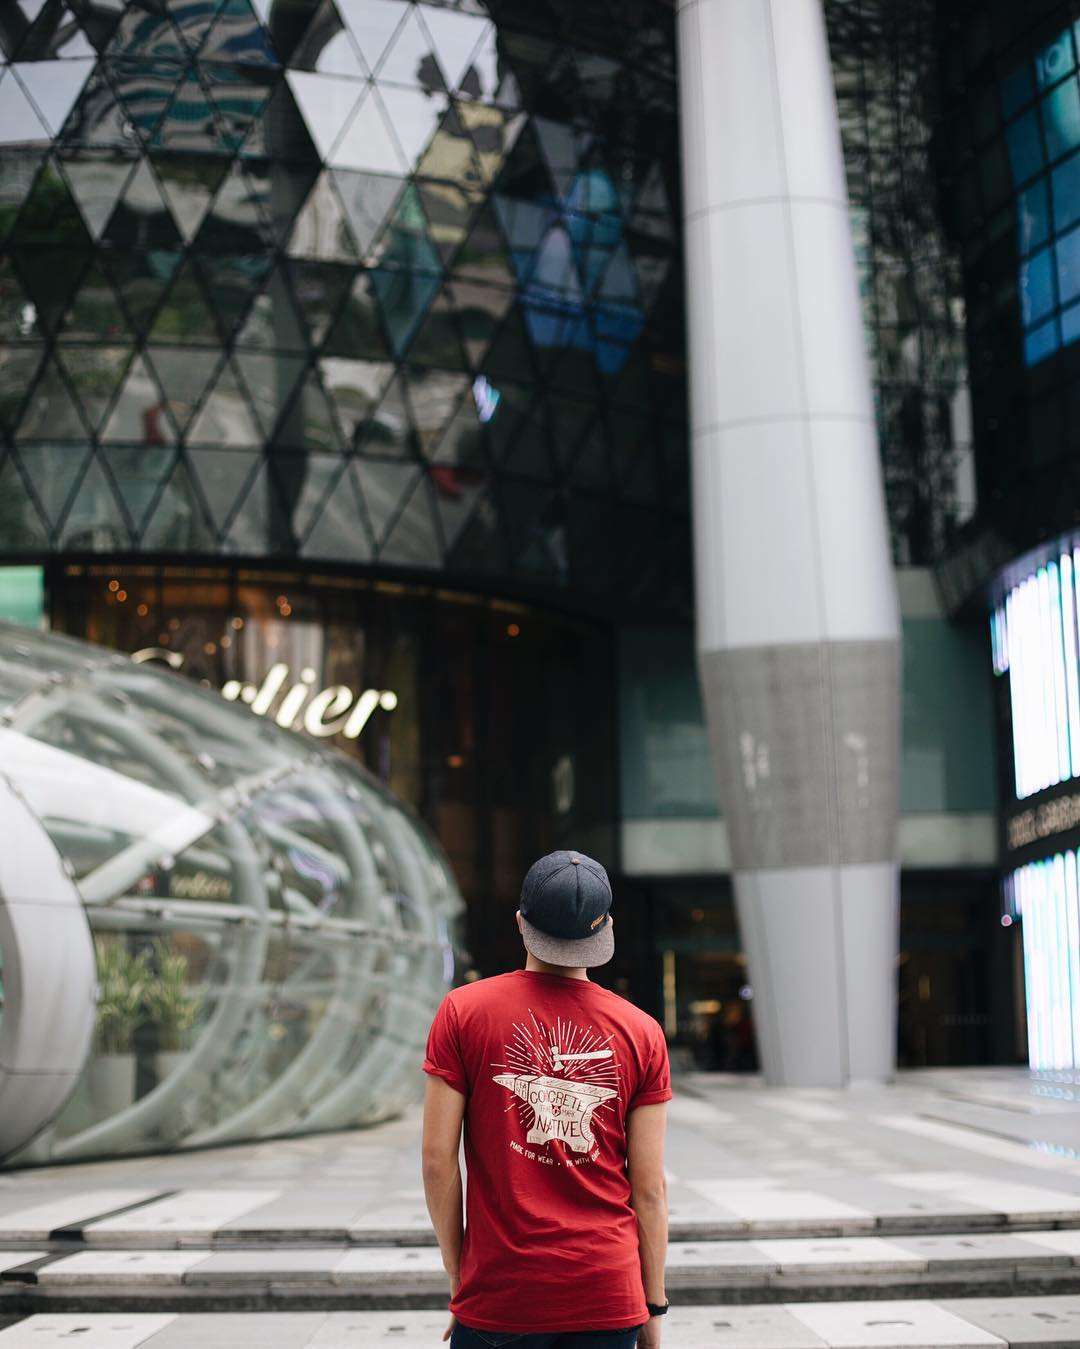 Urban Exploring with @lionelimwx in Singapore. #concretenative #explore #exploremore #adventure #adventurelife #urbanexploring #realshitforrealpeople #skateboarding #sk8life #skate